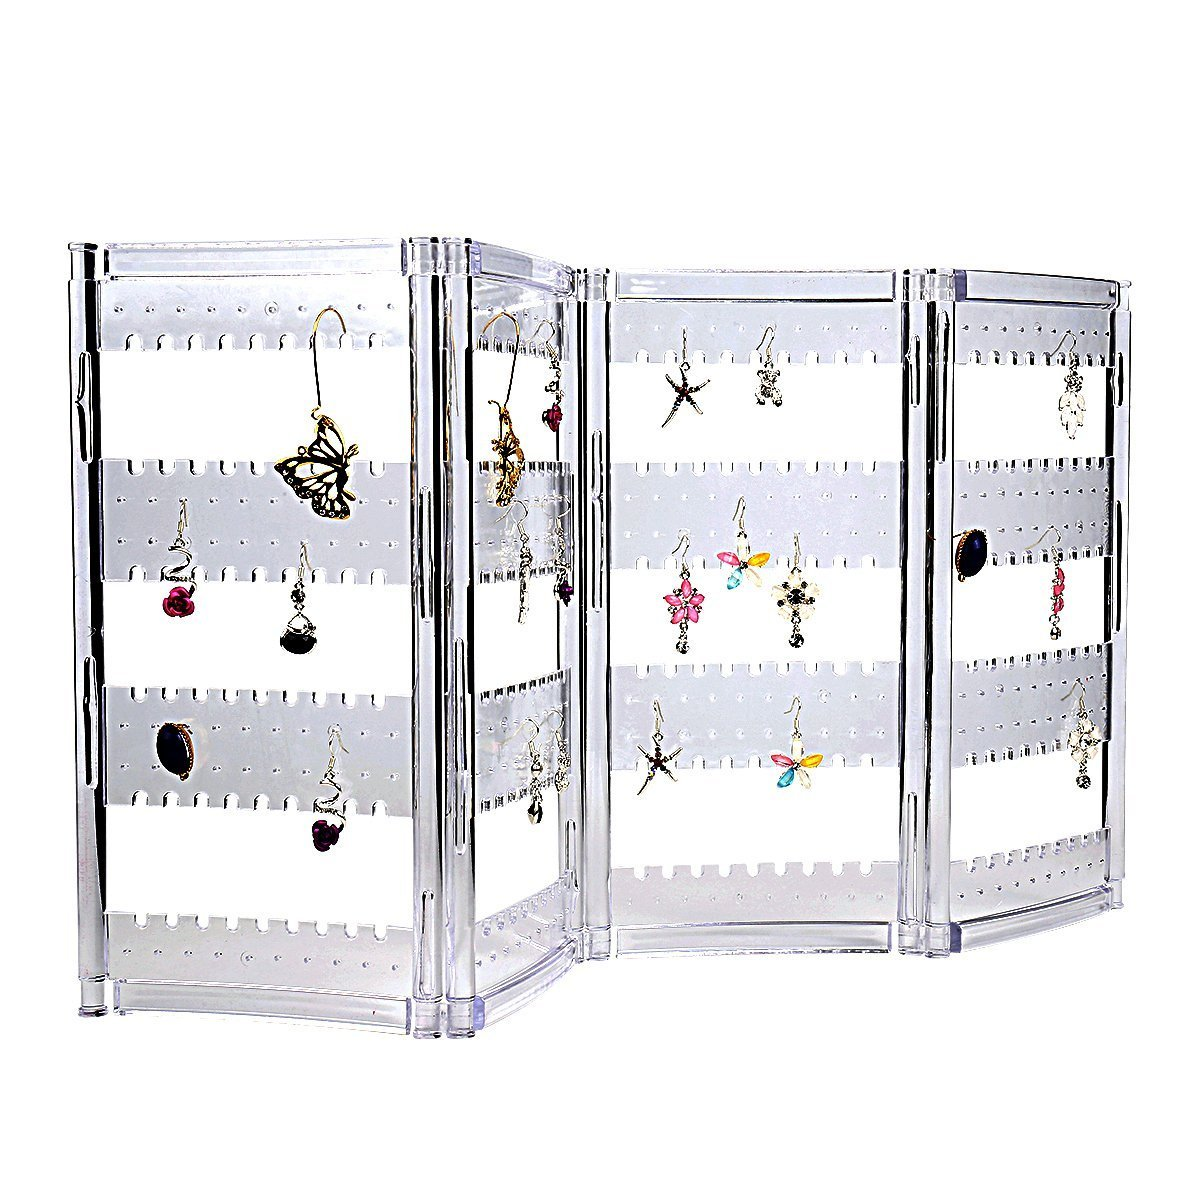 Sky Piea Acrylic Foldable 240 Grids Earring Jewelry Screen Holder